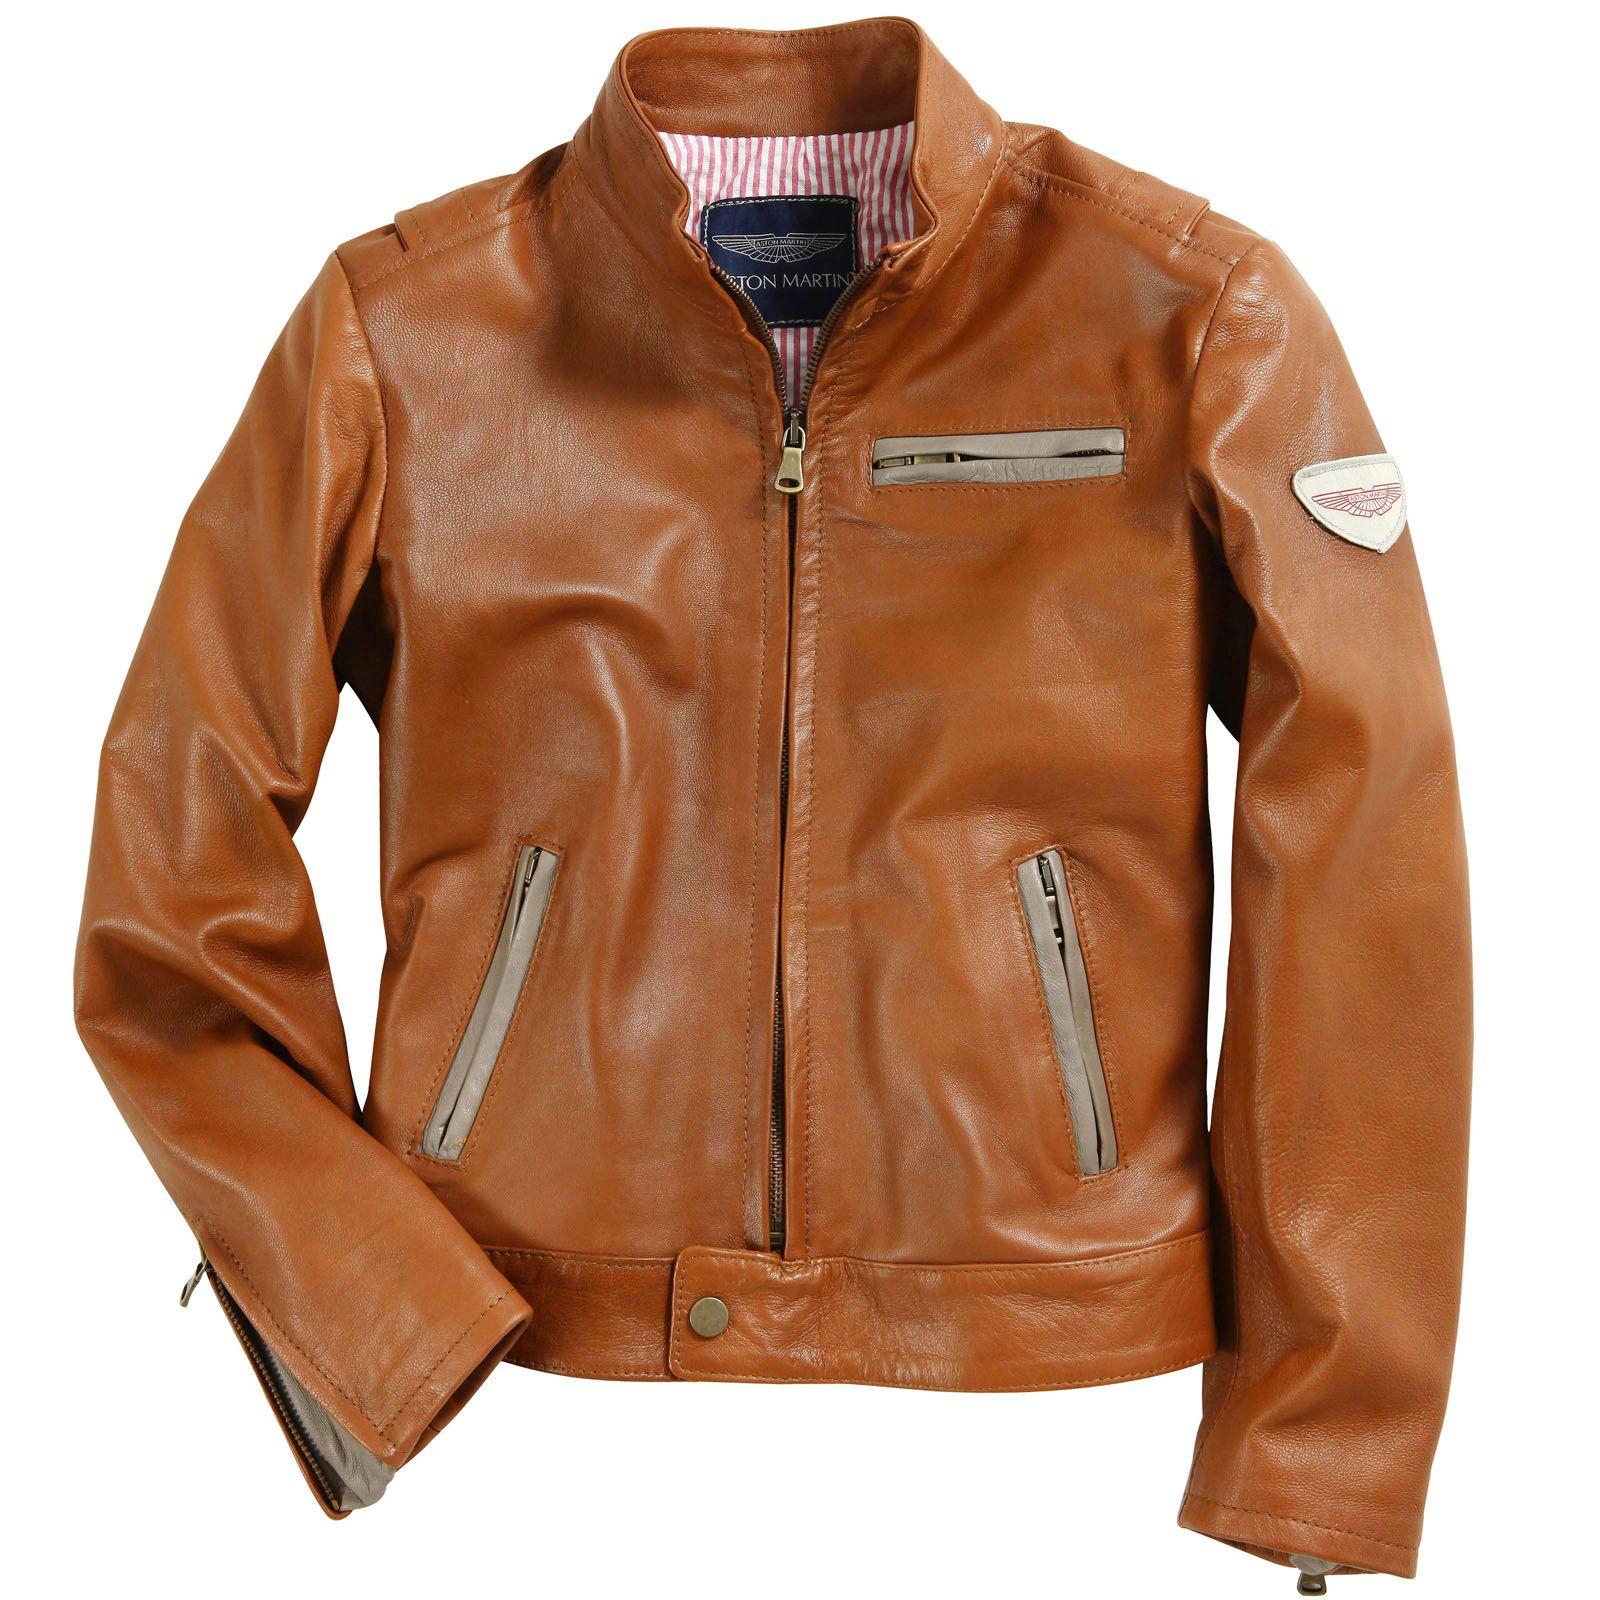 Aston Martin Leather Jacket Brown 34801 Melijoe Com Leather Jacket Brown Leather Jacket Jackets